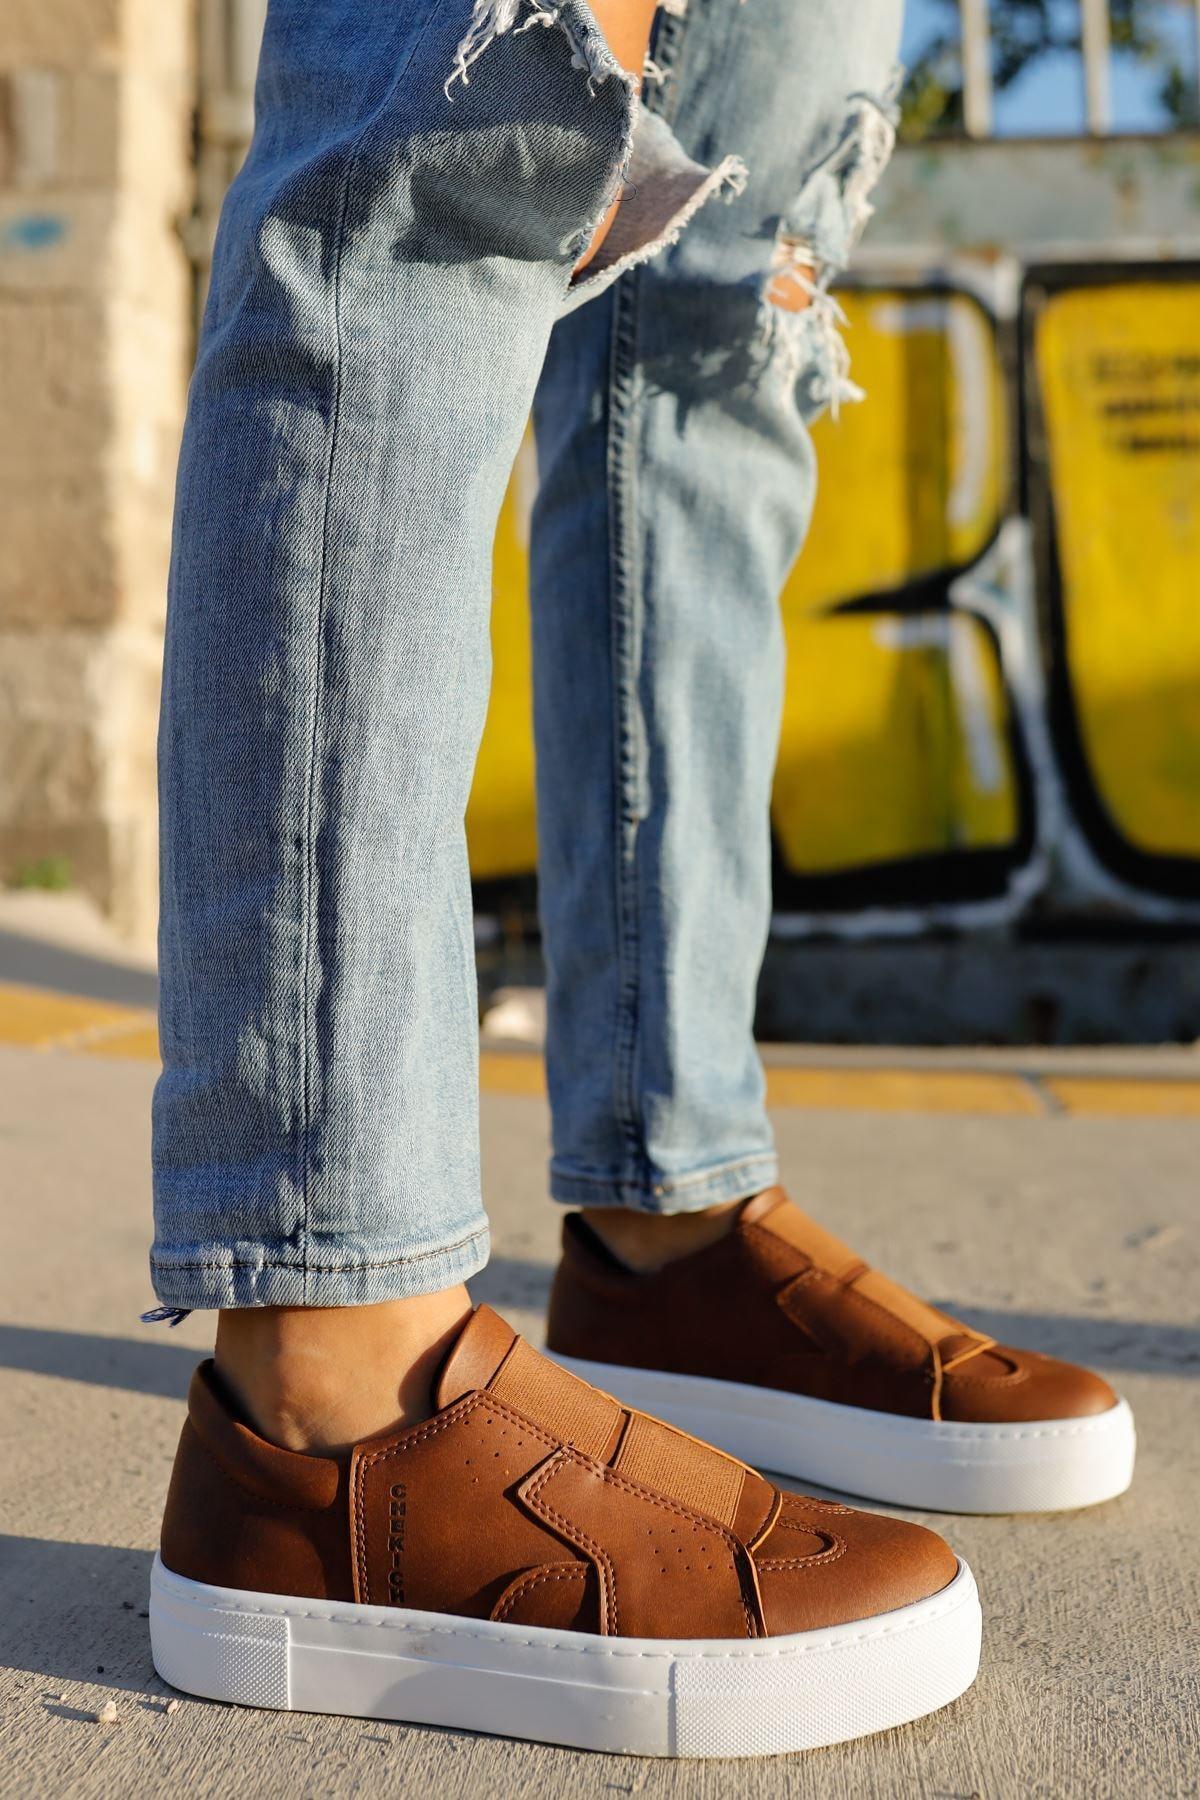 Chekich Ch033 Bt Kadın Ayakkabı Taba 2